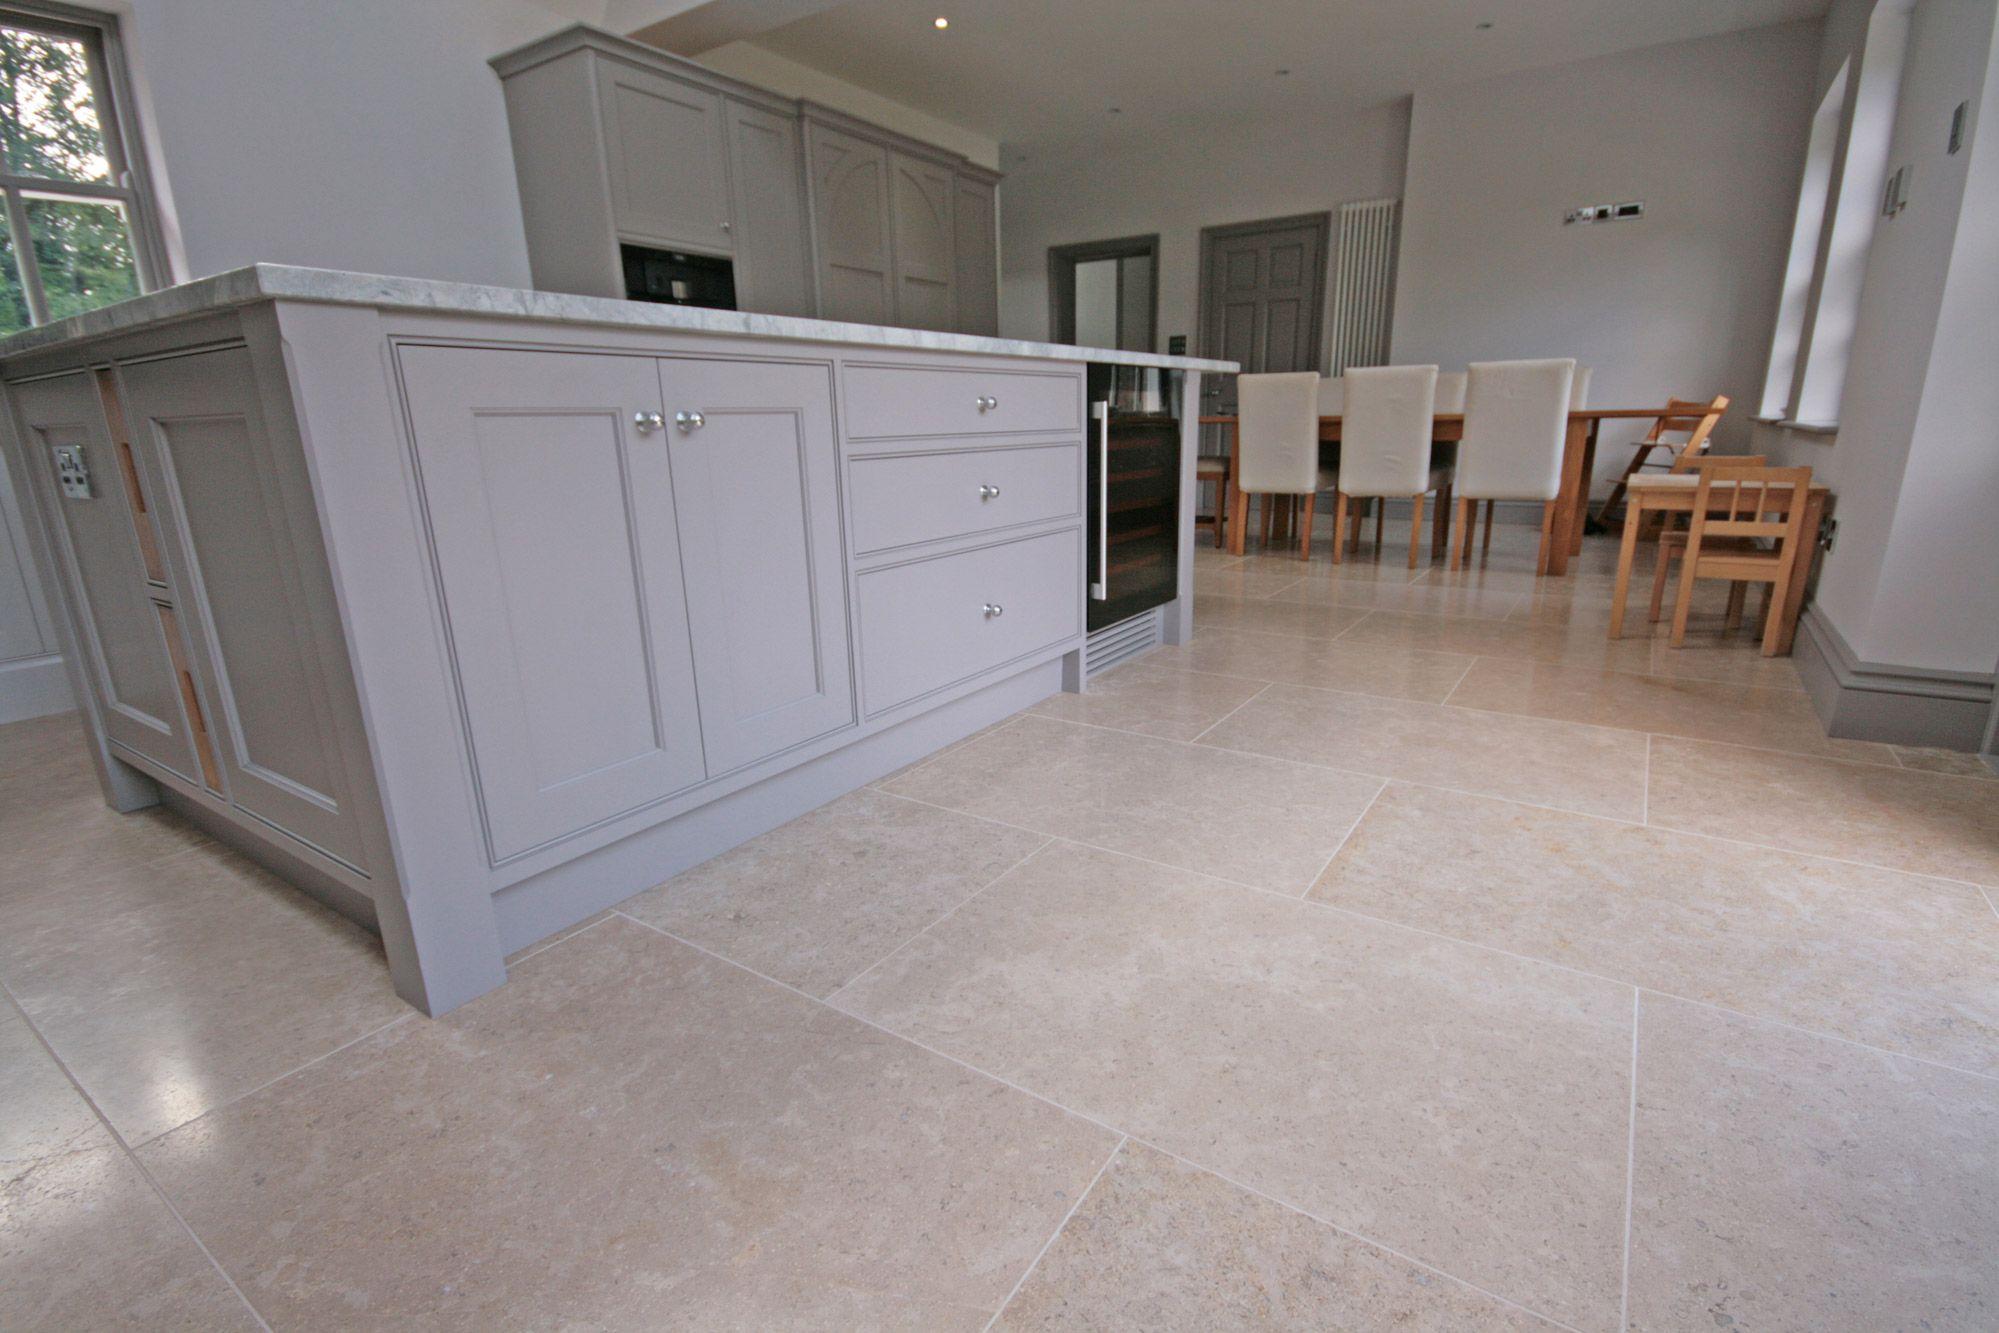 Dijon limestone flooring ideas kitchens and house dijon brushed limestone floor tiles limestone dailygadgetfo Images